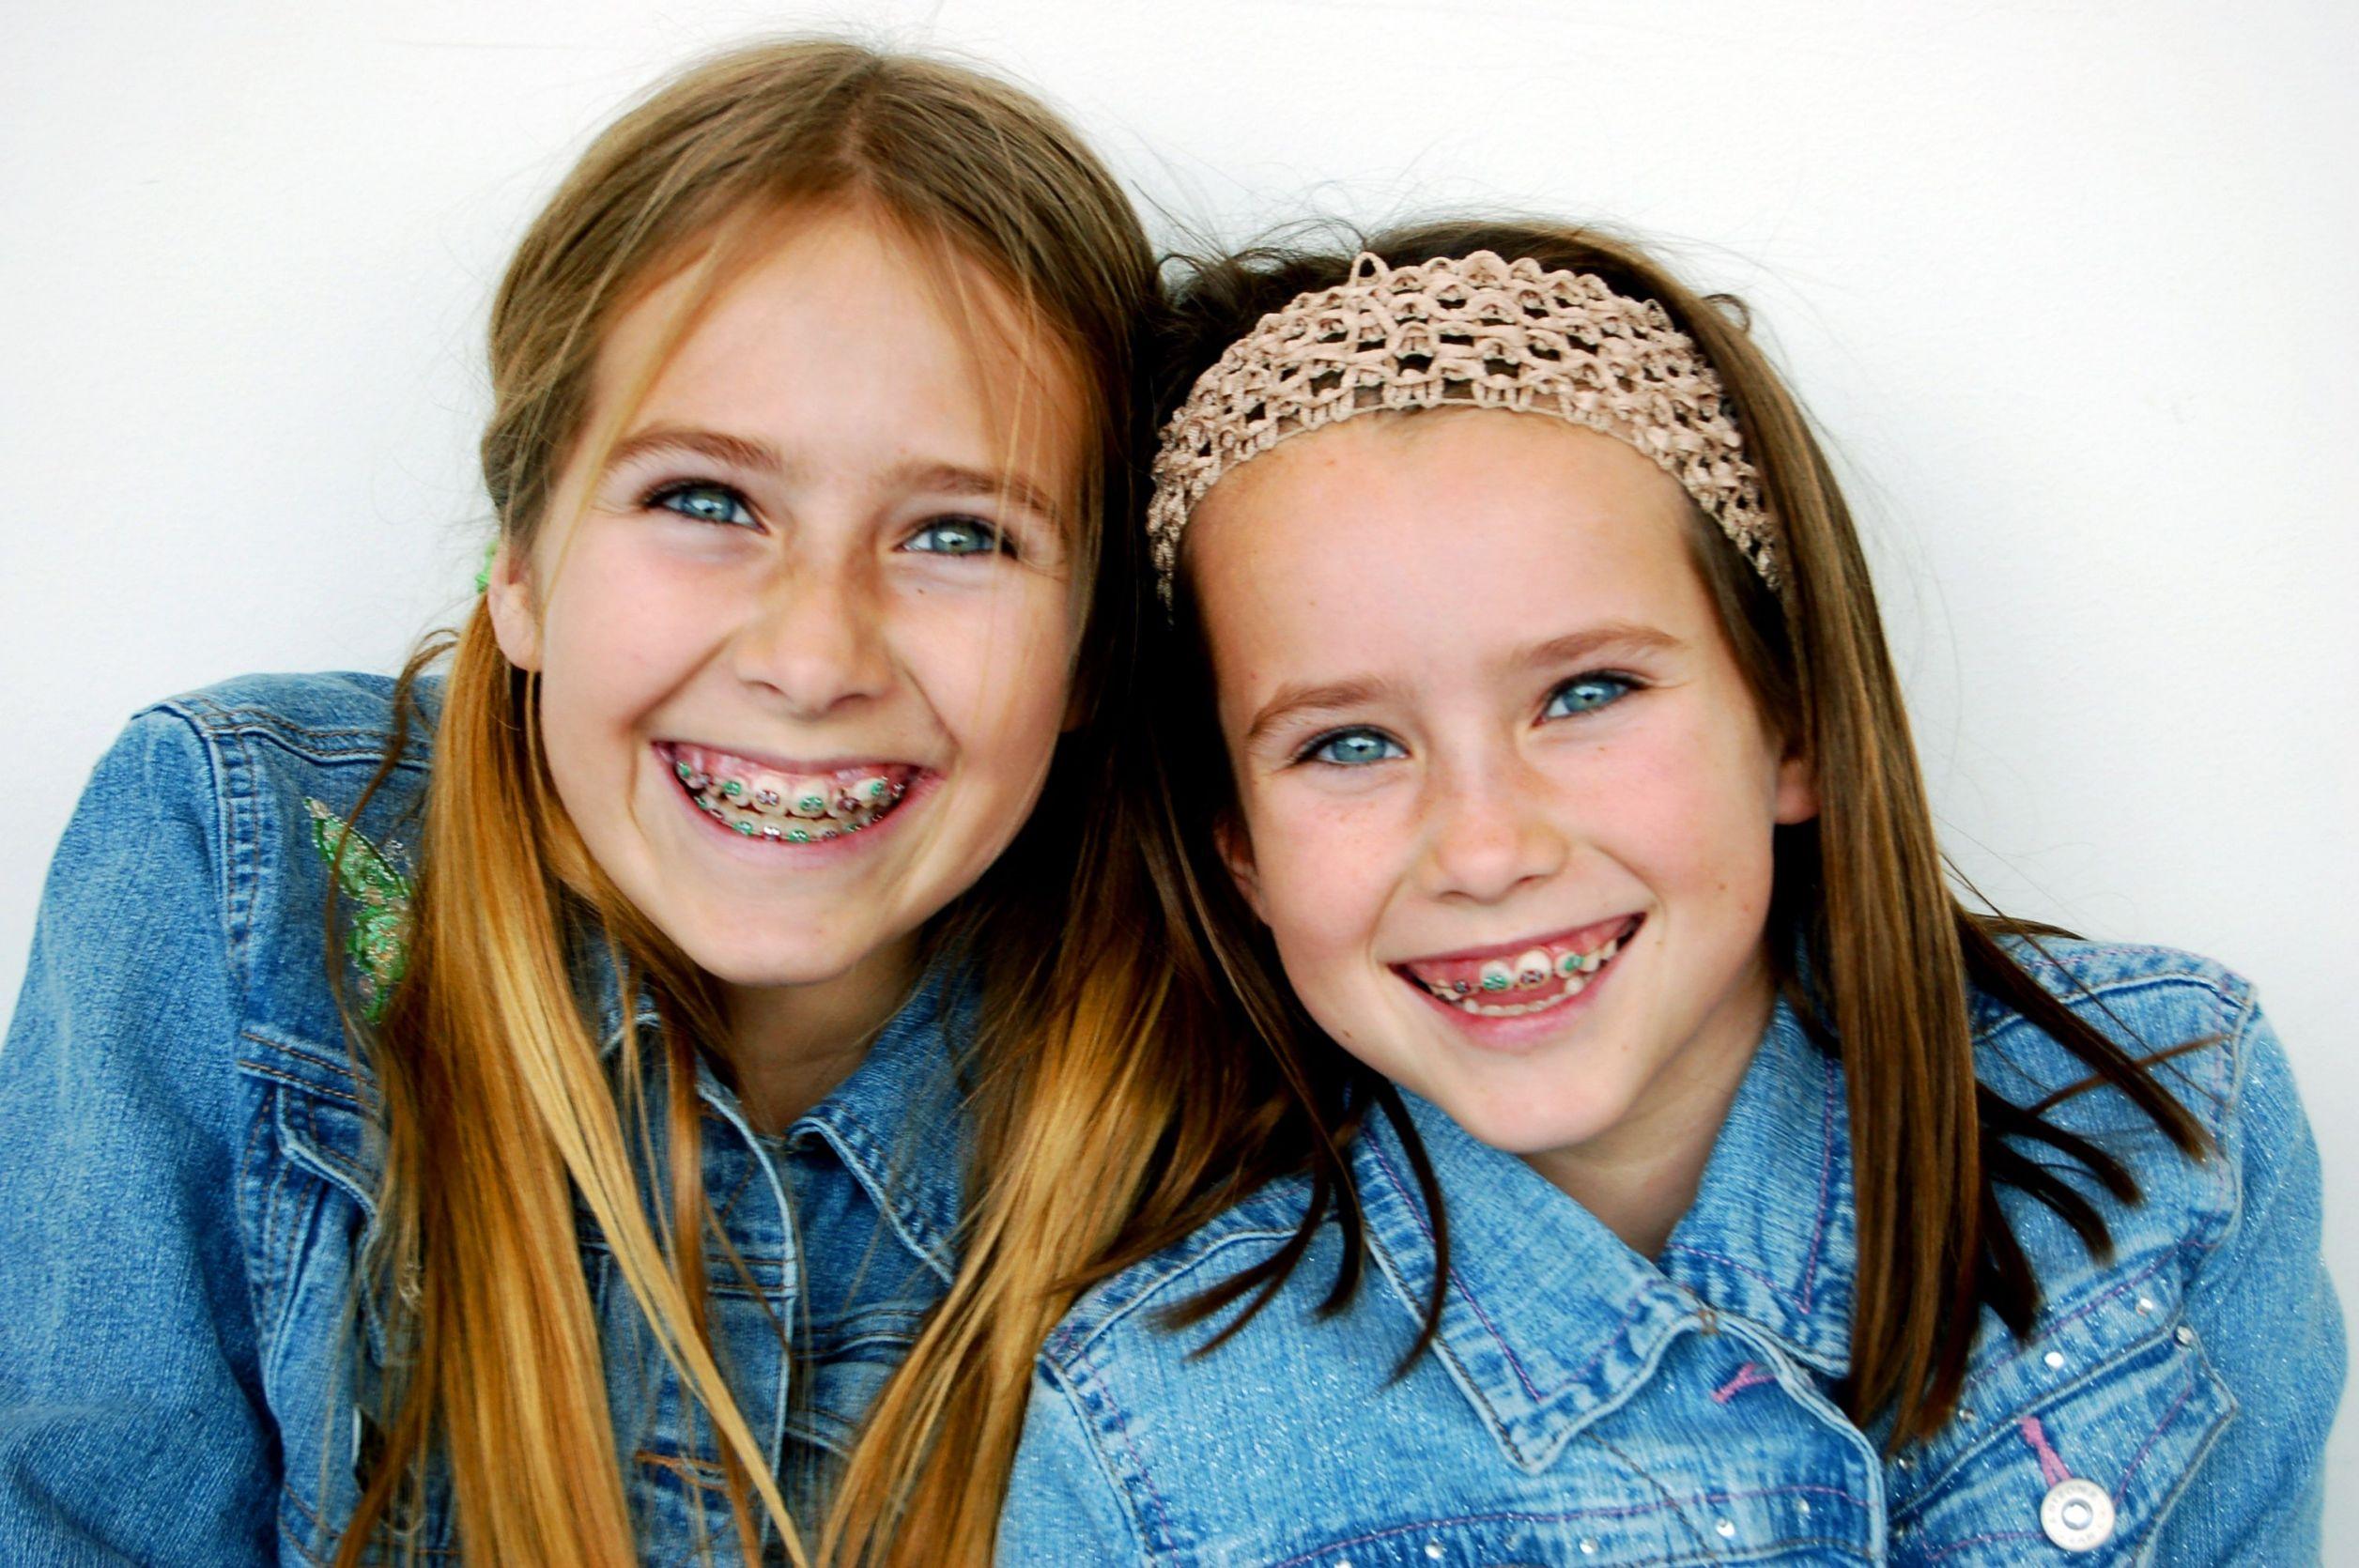 Types of child braces